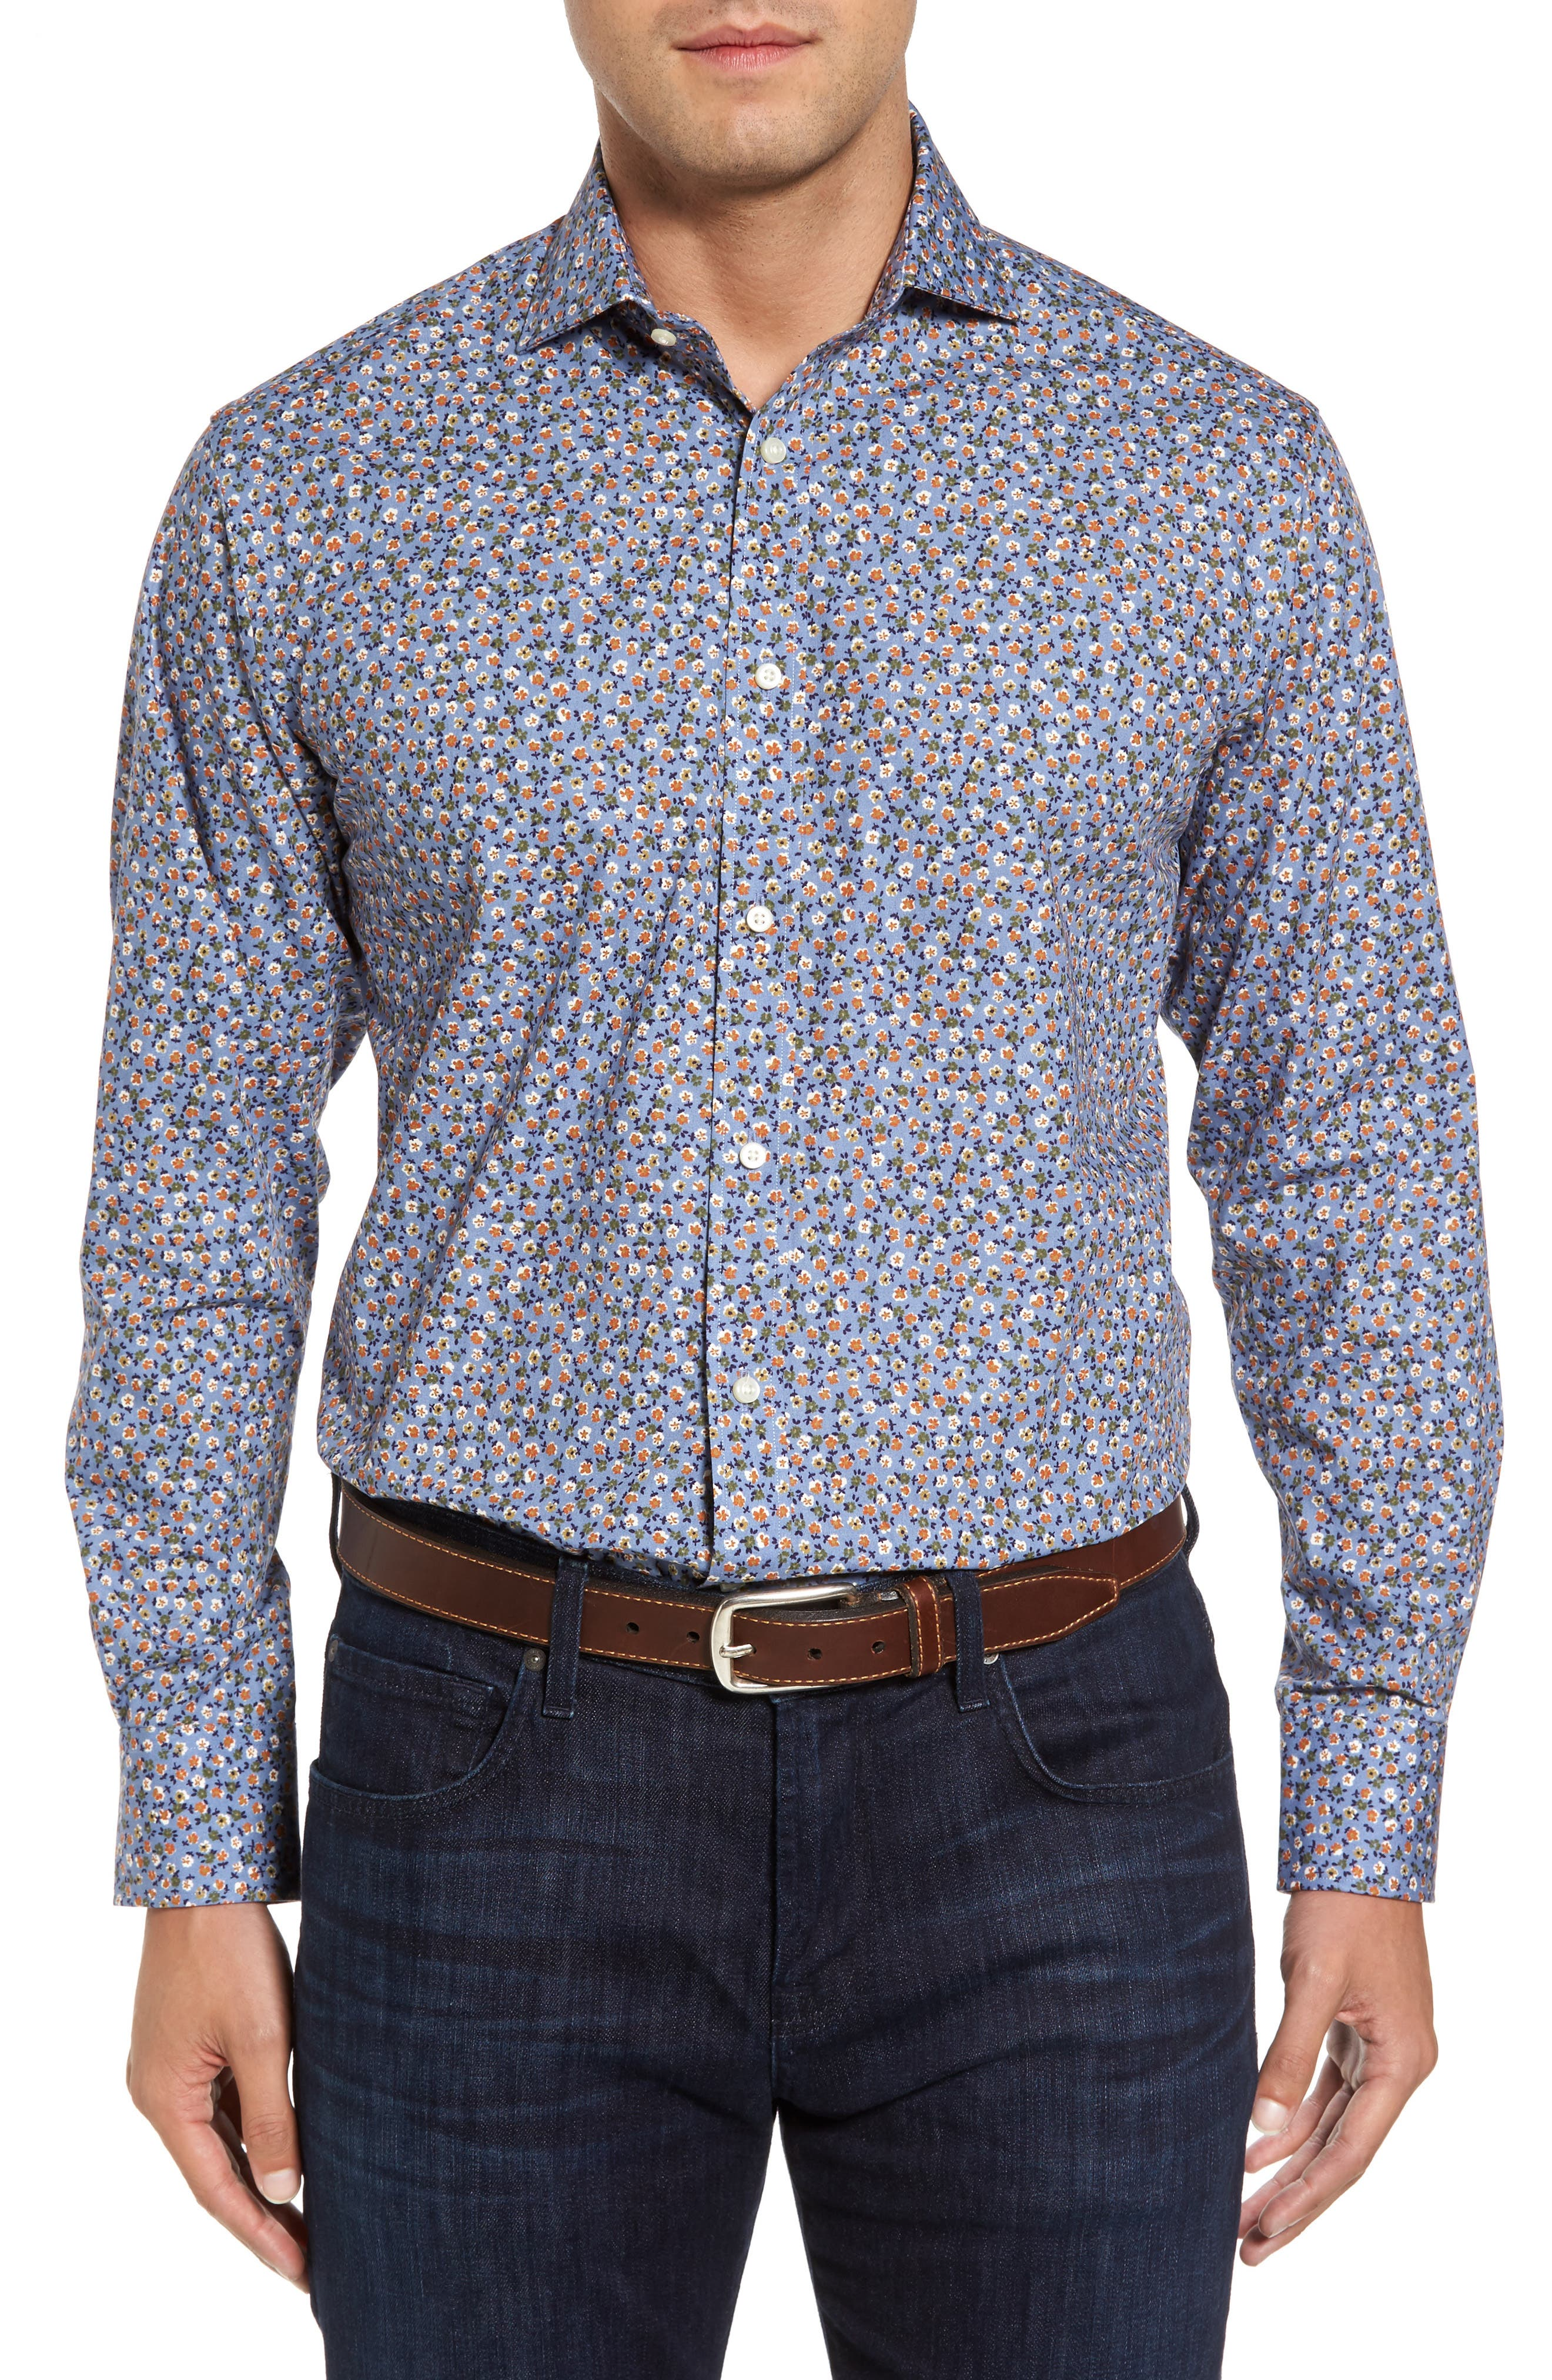 Alternate Image 1 Selected - Thomas Dean Regular Fit Floral Print Sport Shirt